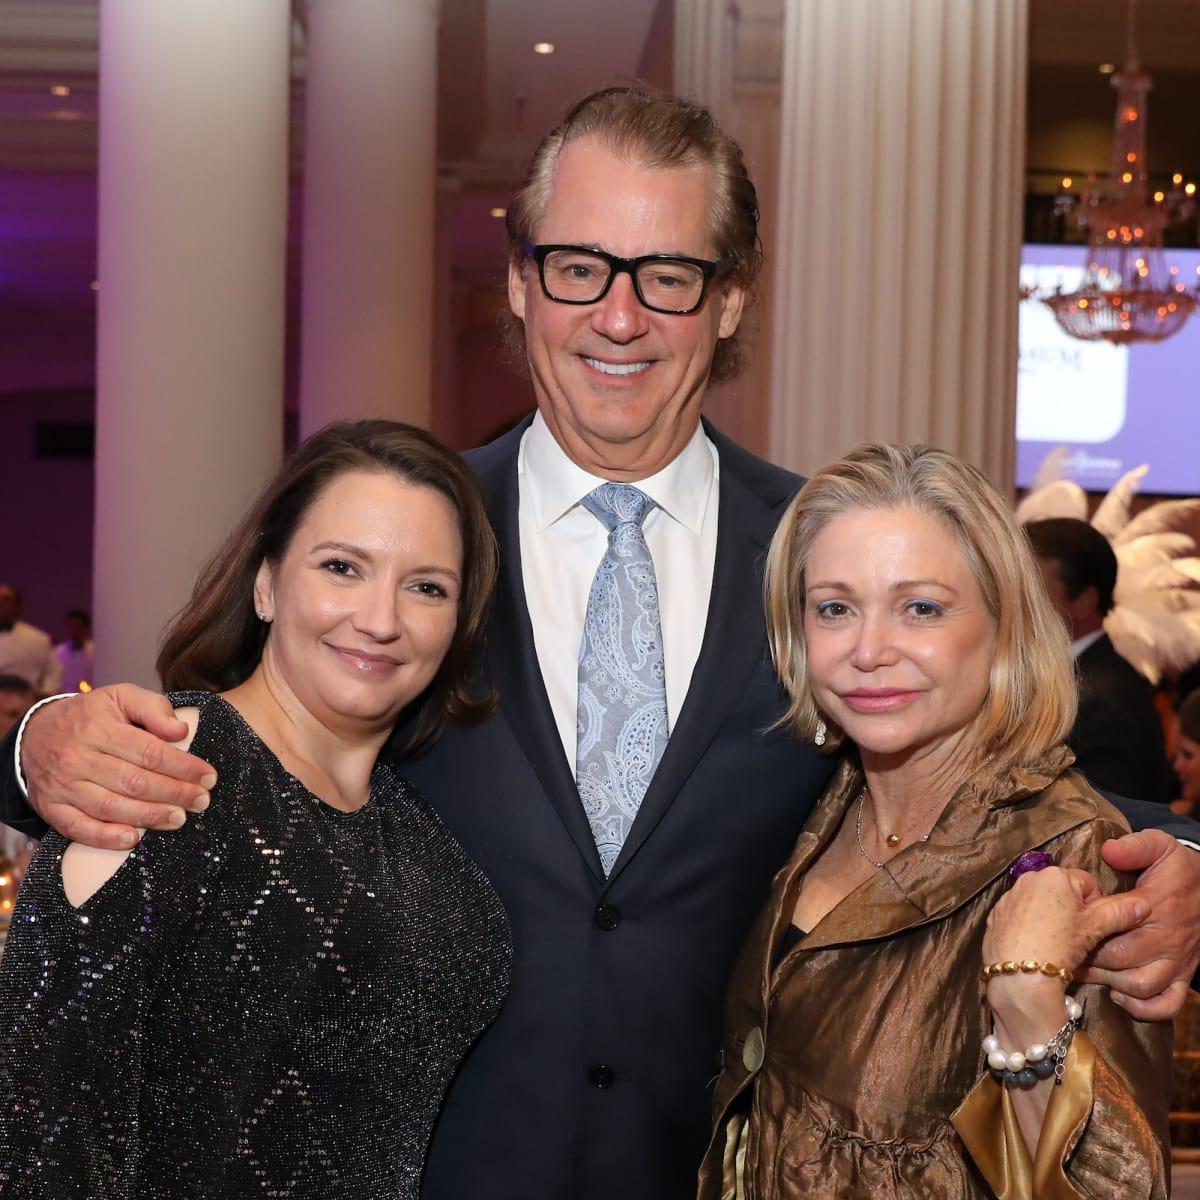 Houston, March of Dimes Signature Chefs, November 2017, Darcie Wells, Robert Del Grande, Mimi Del Grande